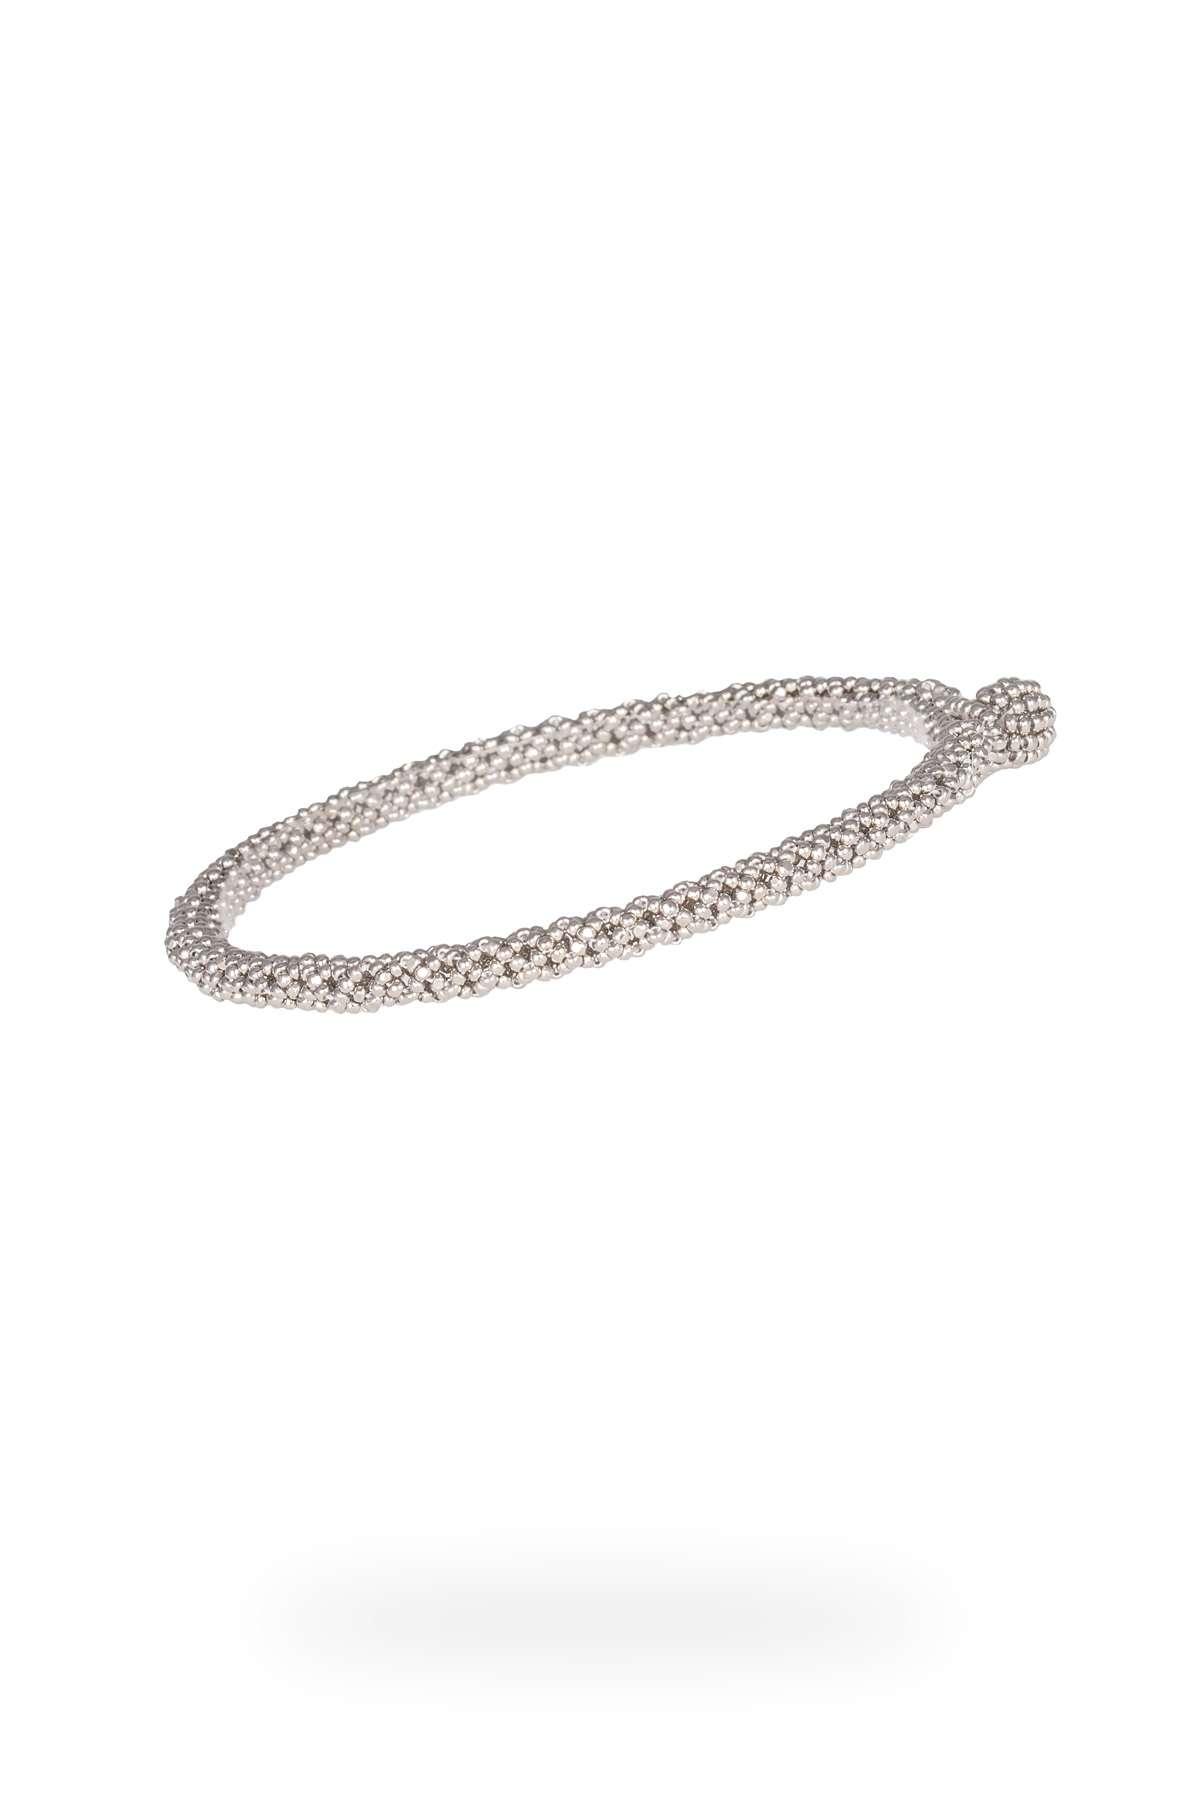 SER005 mini brazalete serpiente plata platino